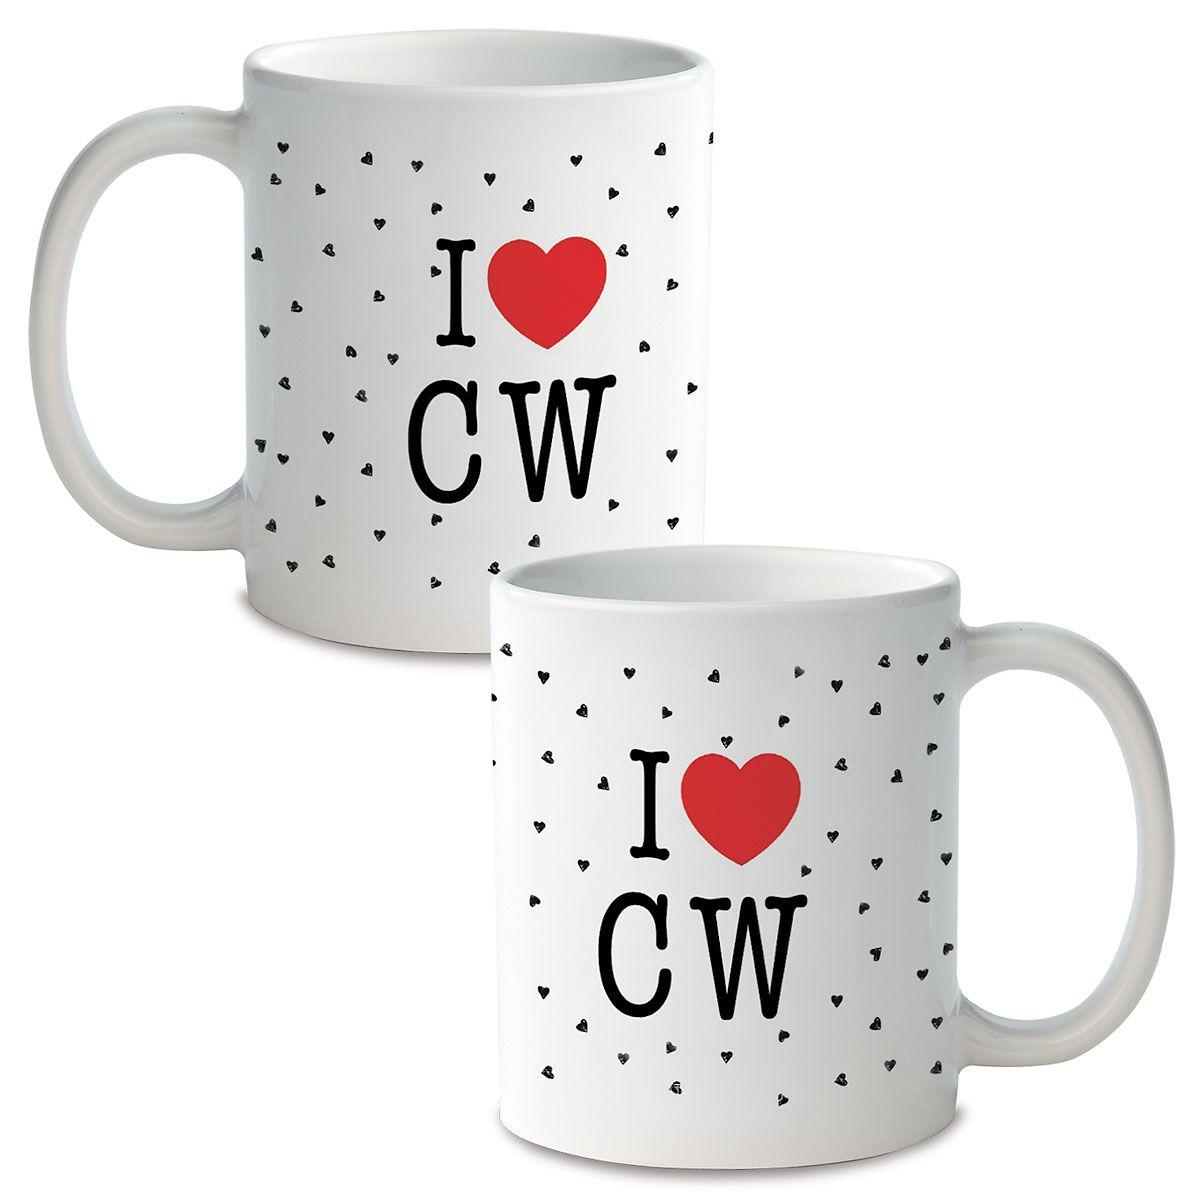 I Love Personalized Ceramic Mug